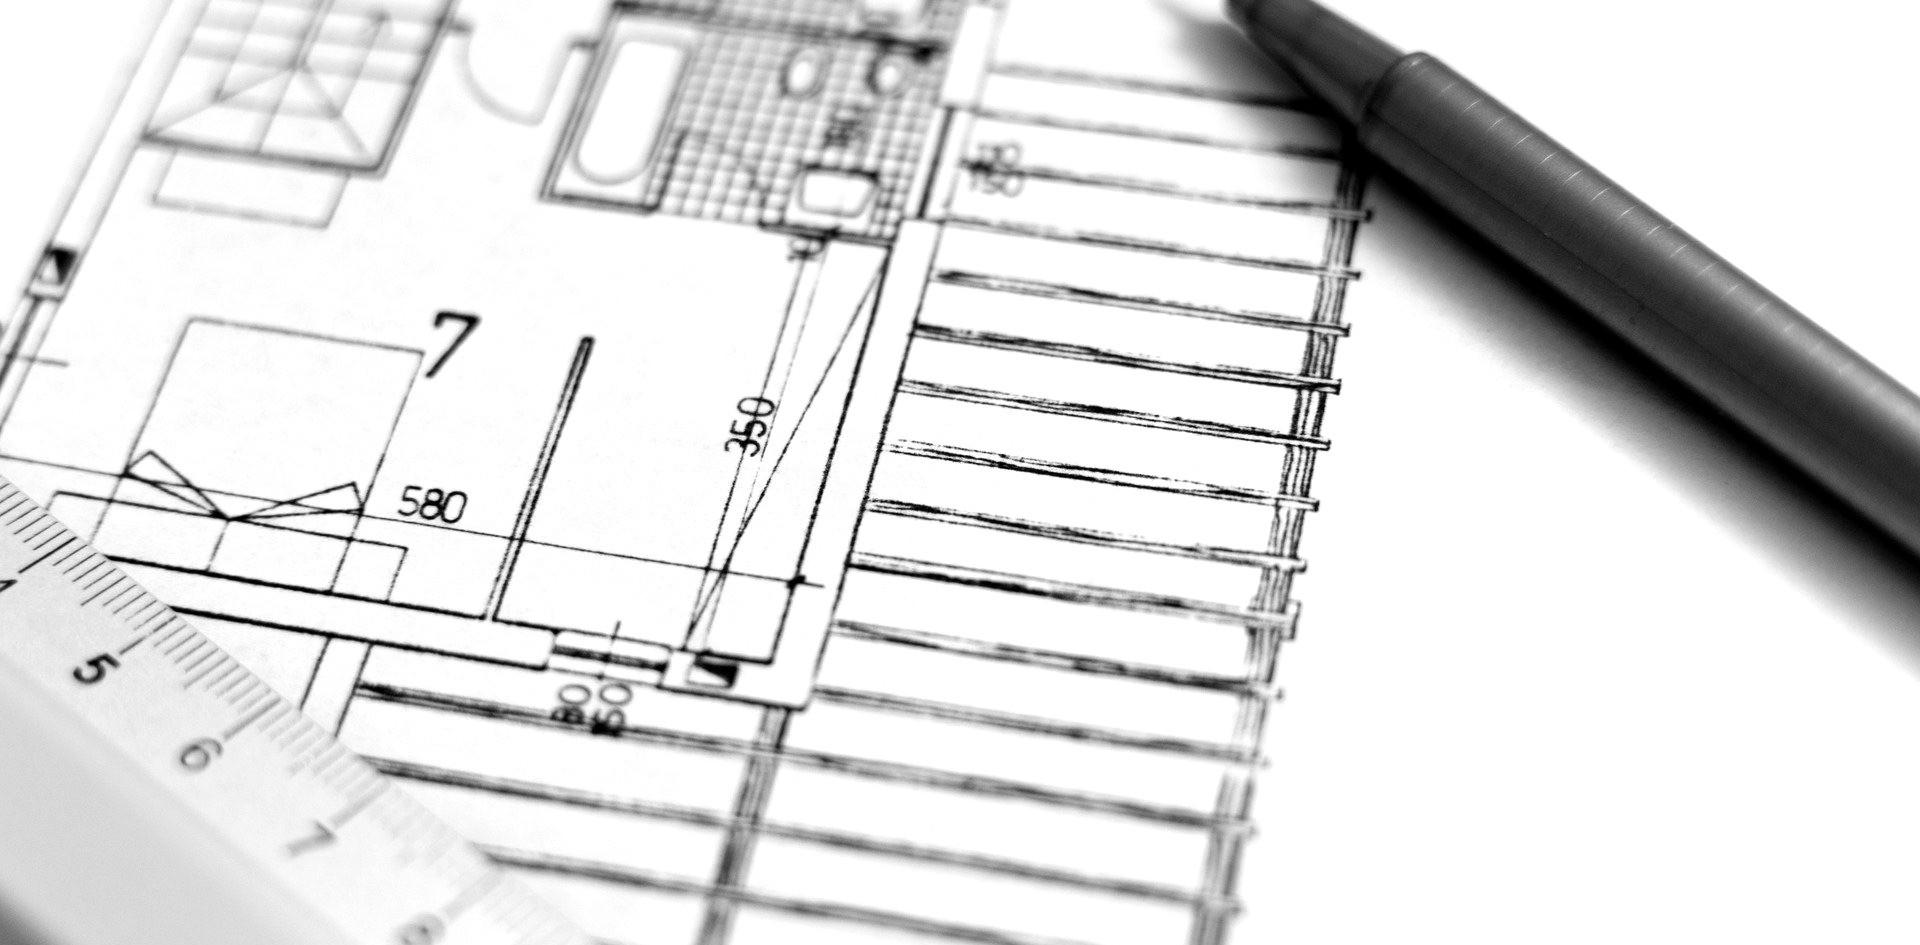 architecture-1857175_1920-2_edited.jpg